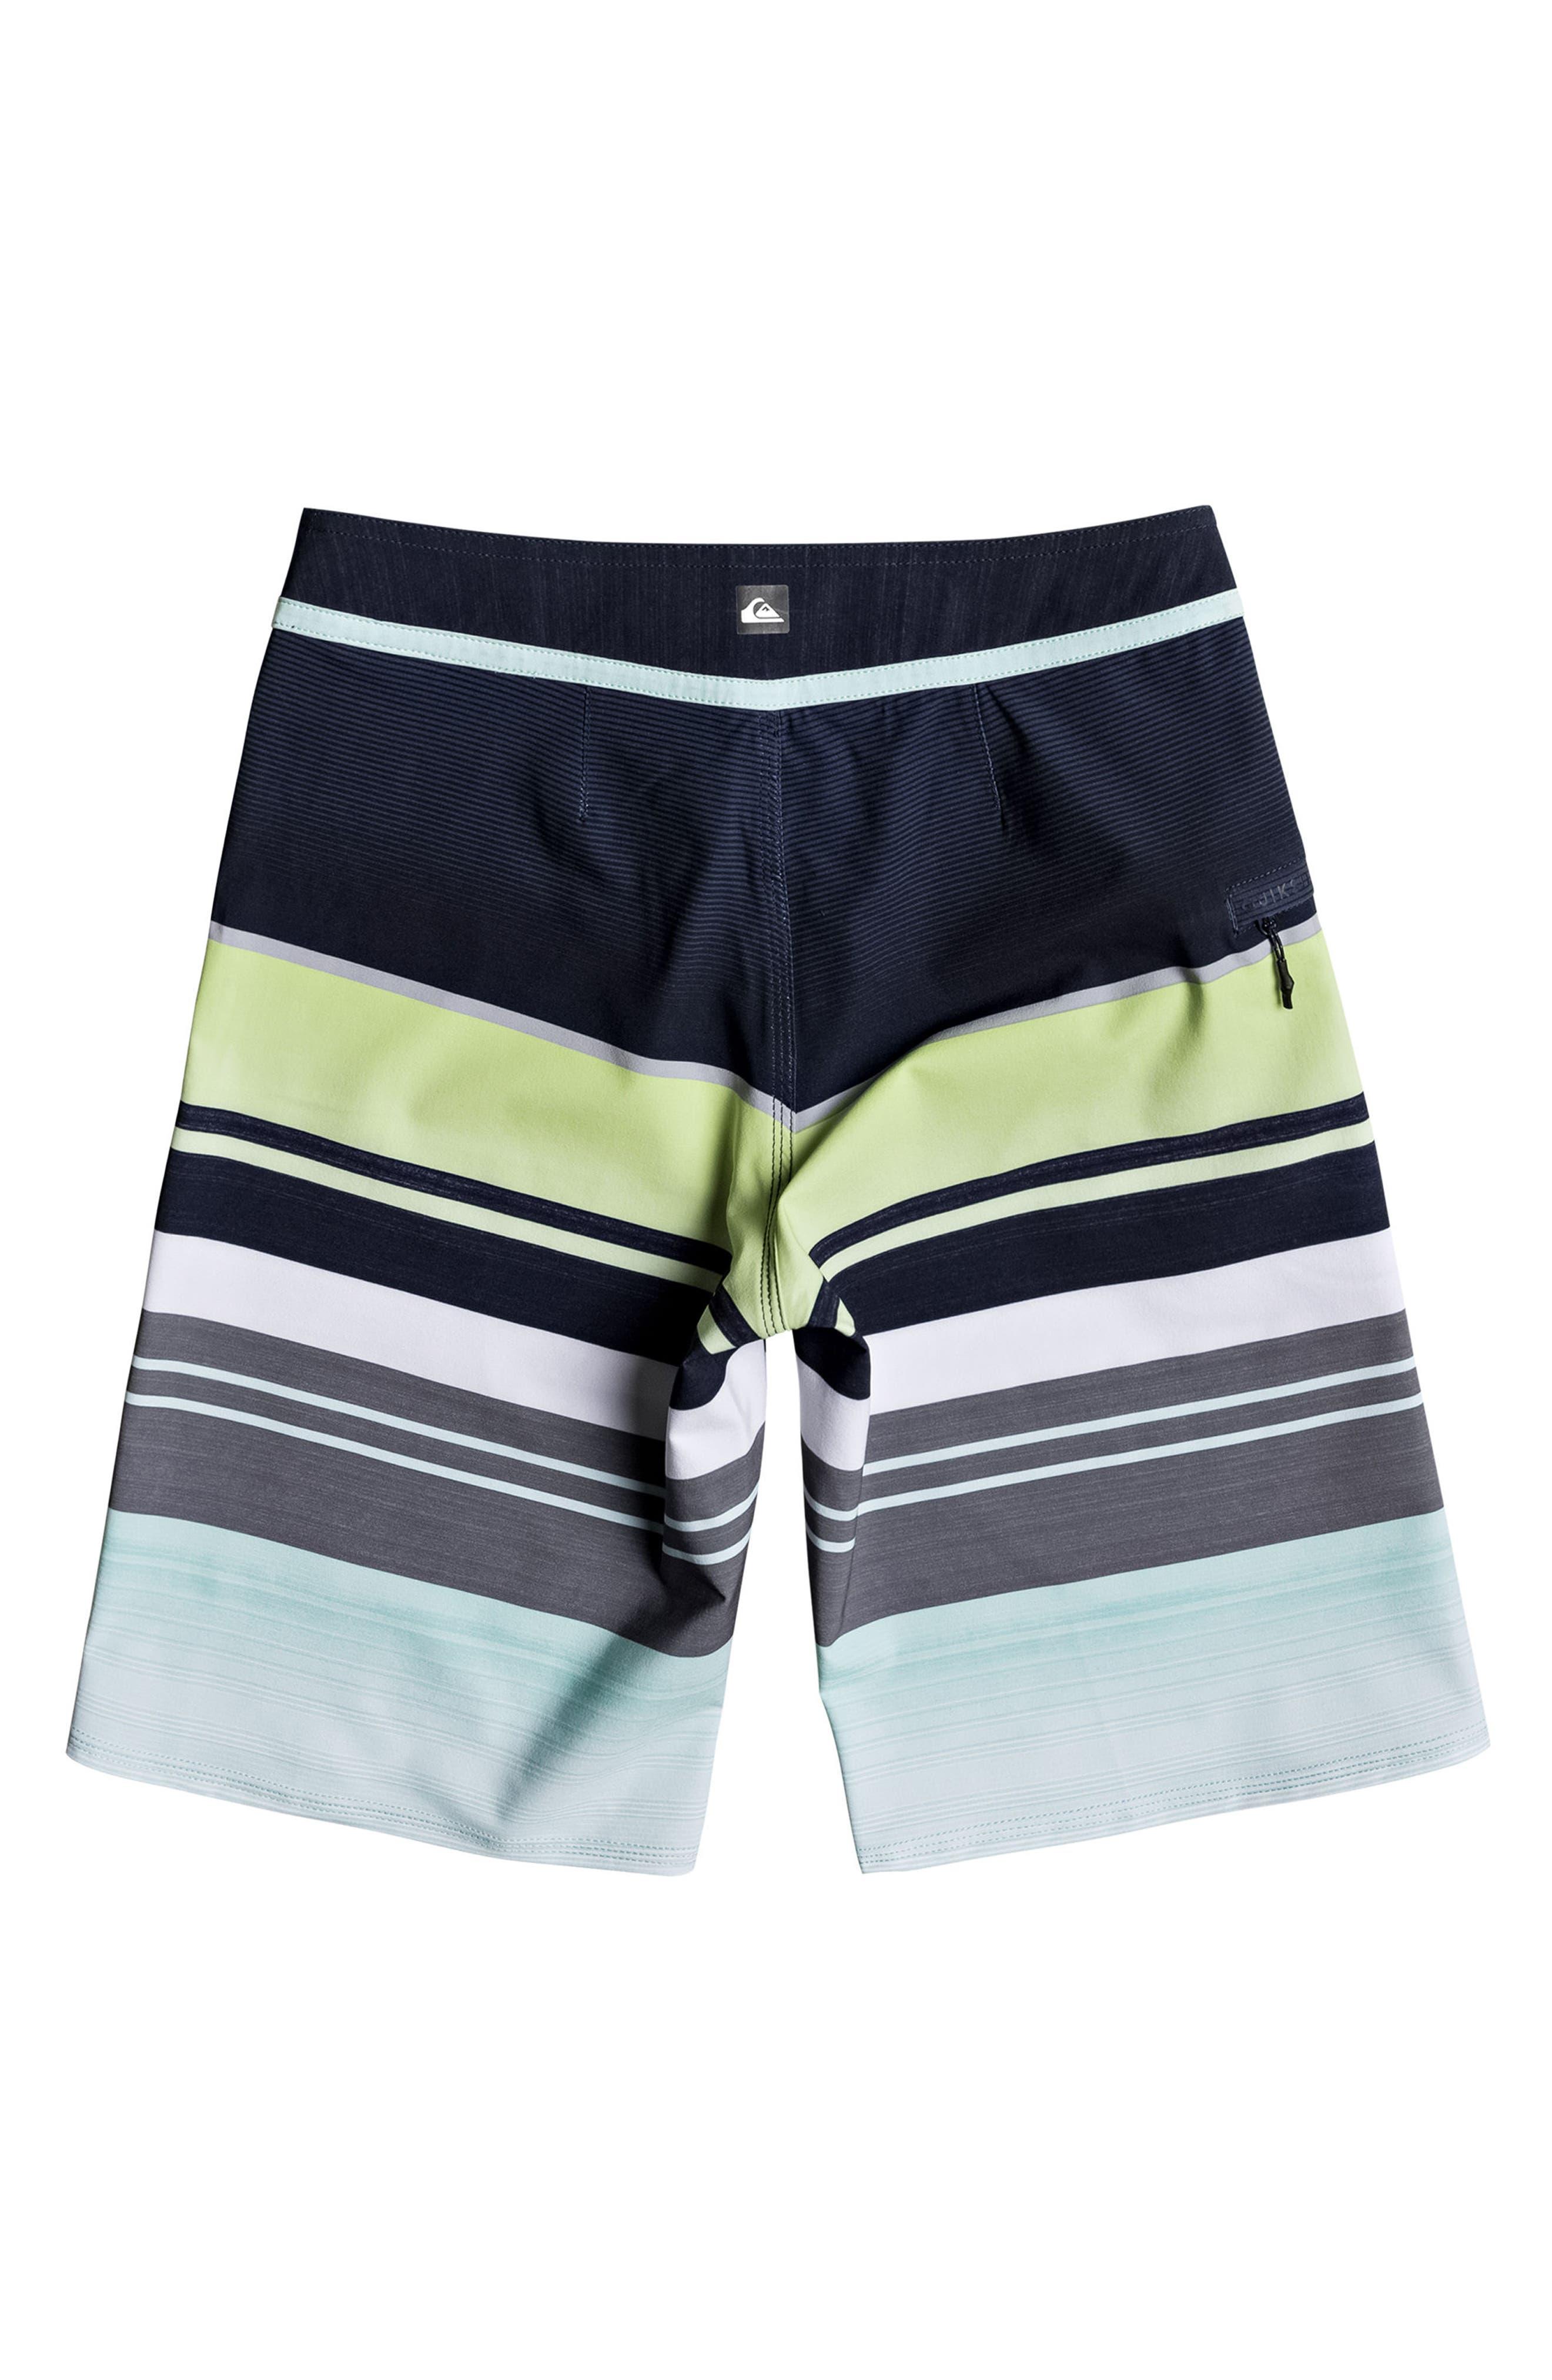 Alternate Image 2  - Quiksilver Everyday Stripe Vee Board Shorts (Big Boys)